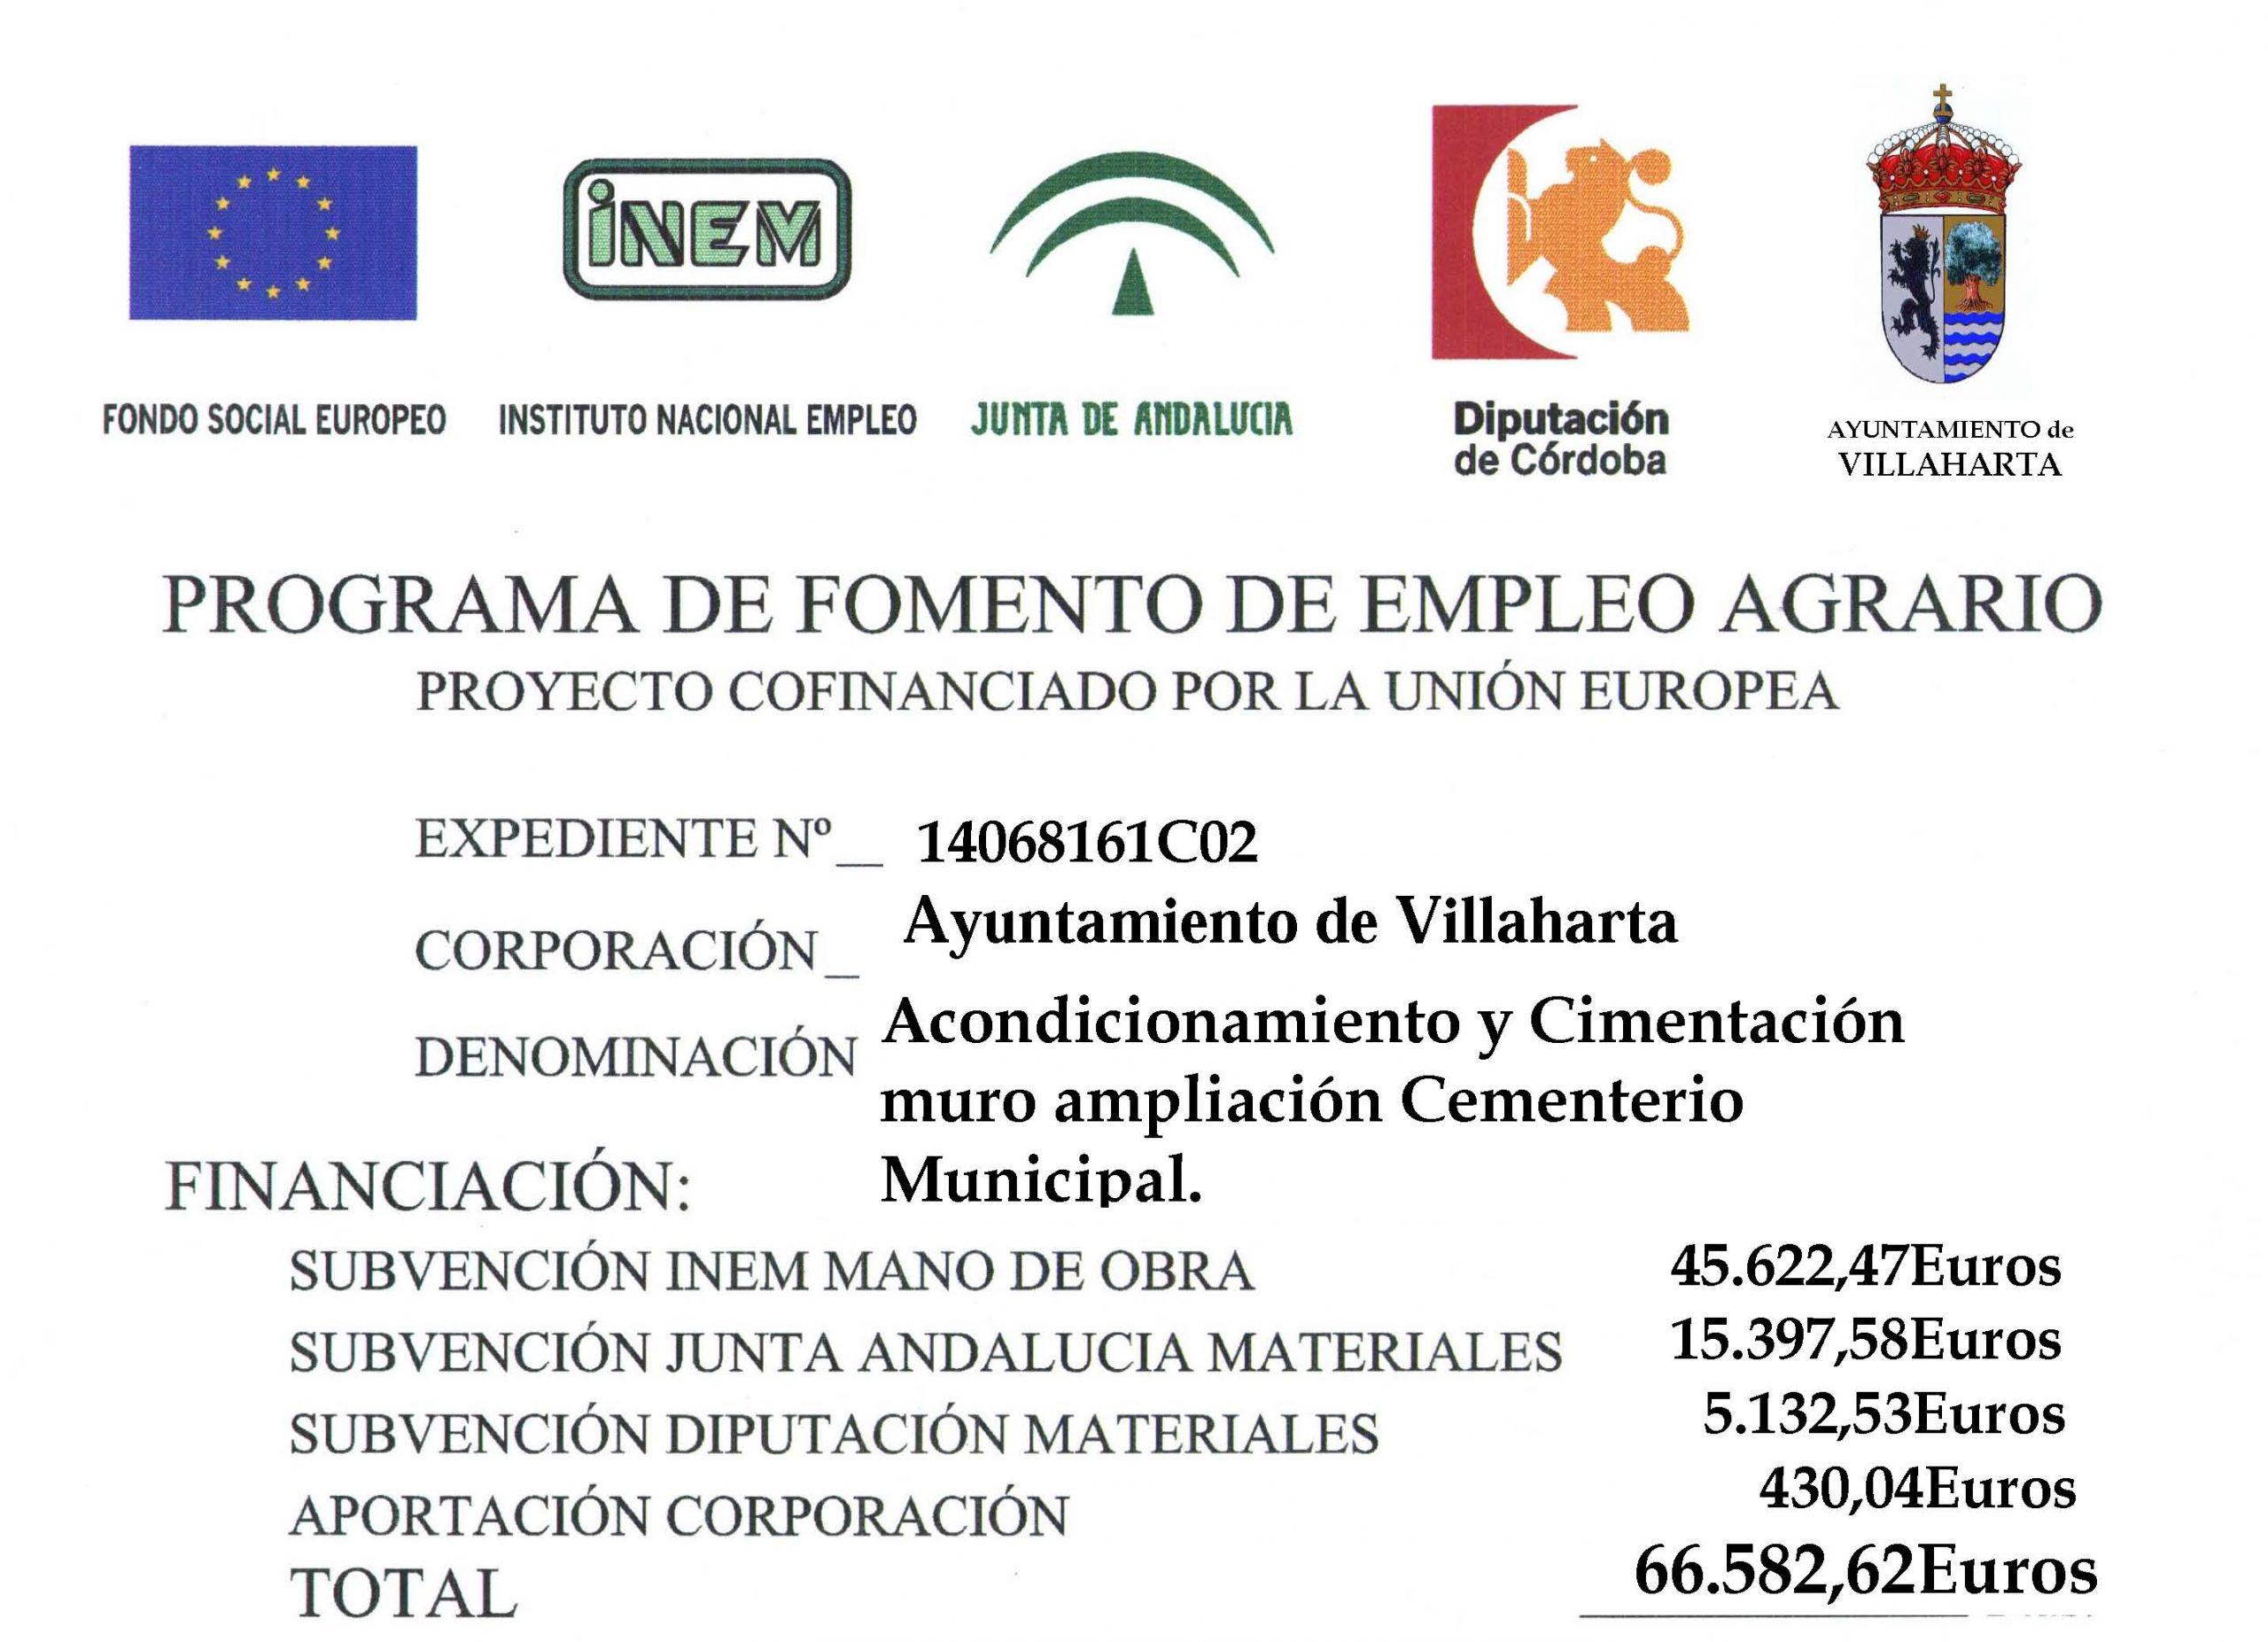 PROGRAMA DE FOMENTO DEL EMPLEO AGRARIO 2016 3